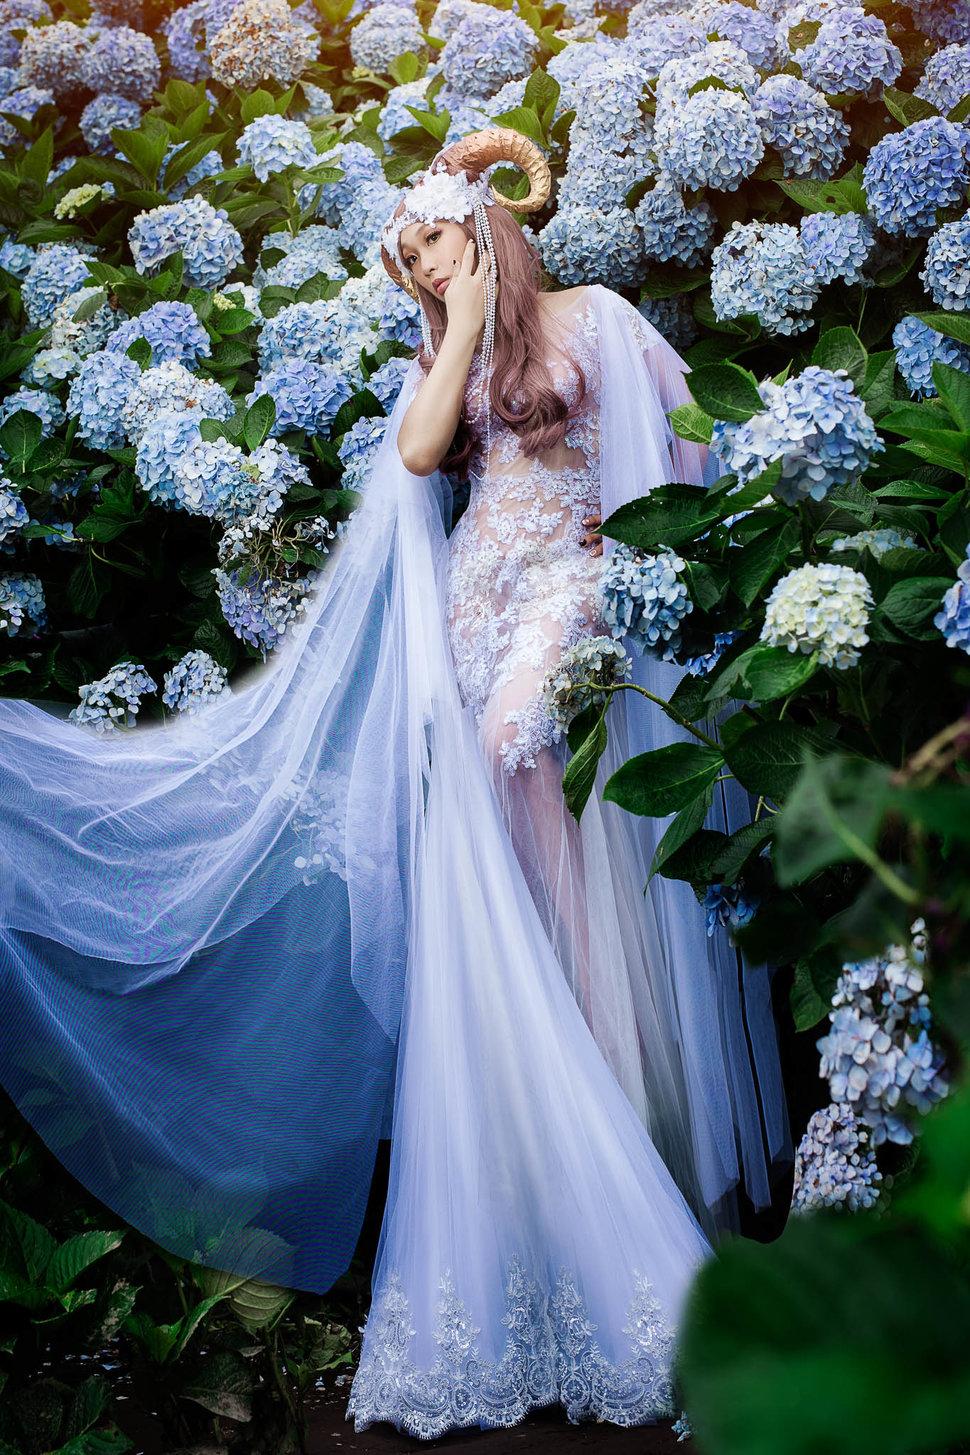 18PHOTO自主婚紗-紫陽花女孩(編號:214908) - 18PHOTO 婚紗影像攝影工作室 - 結婚吧